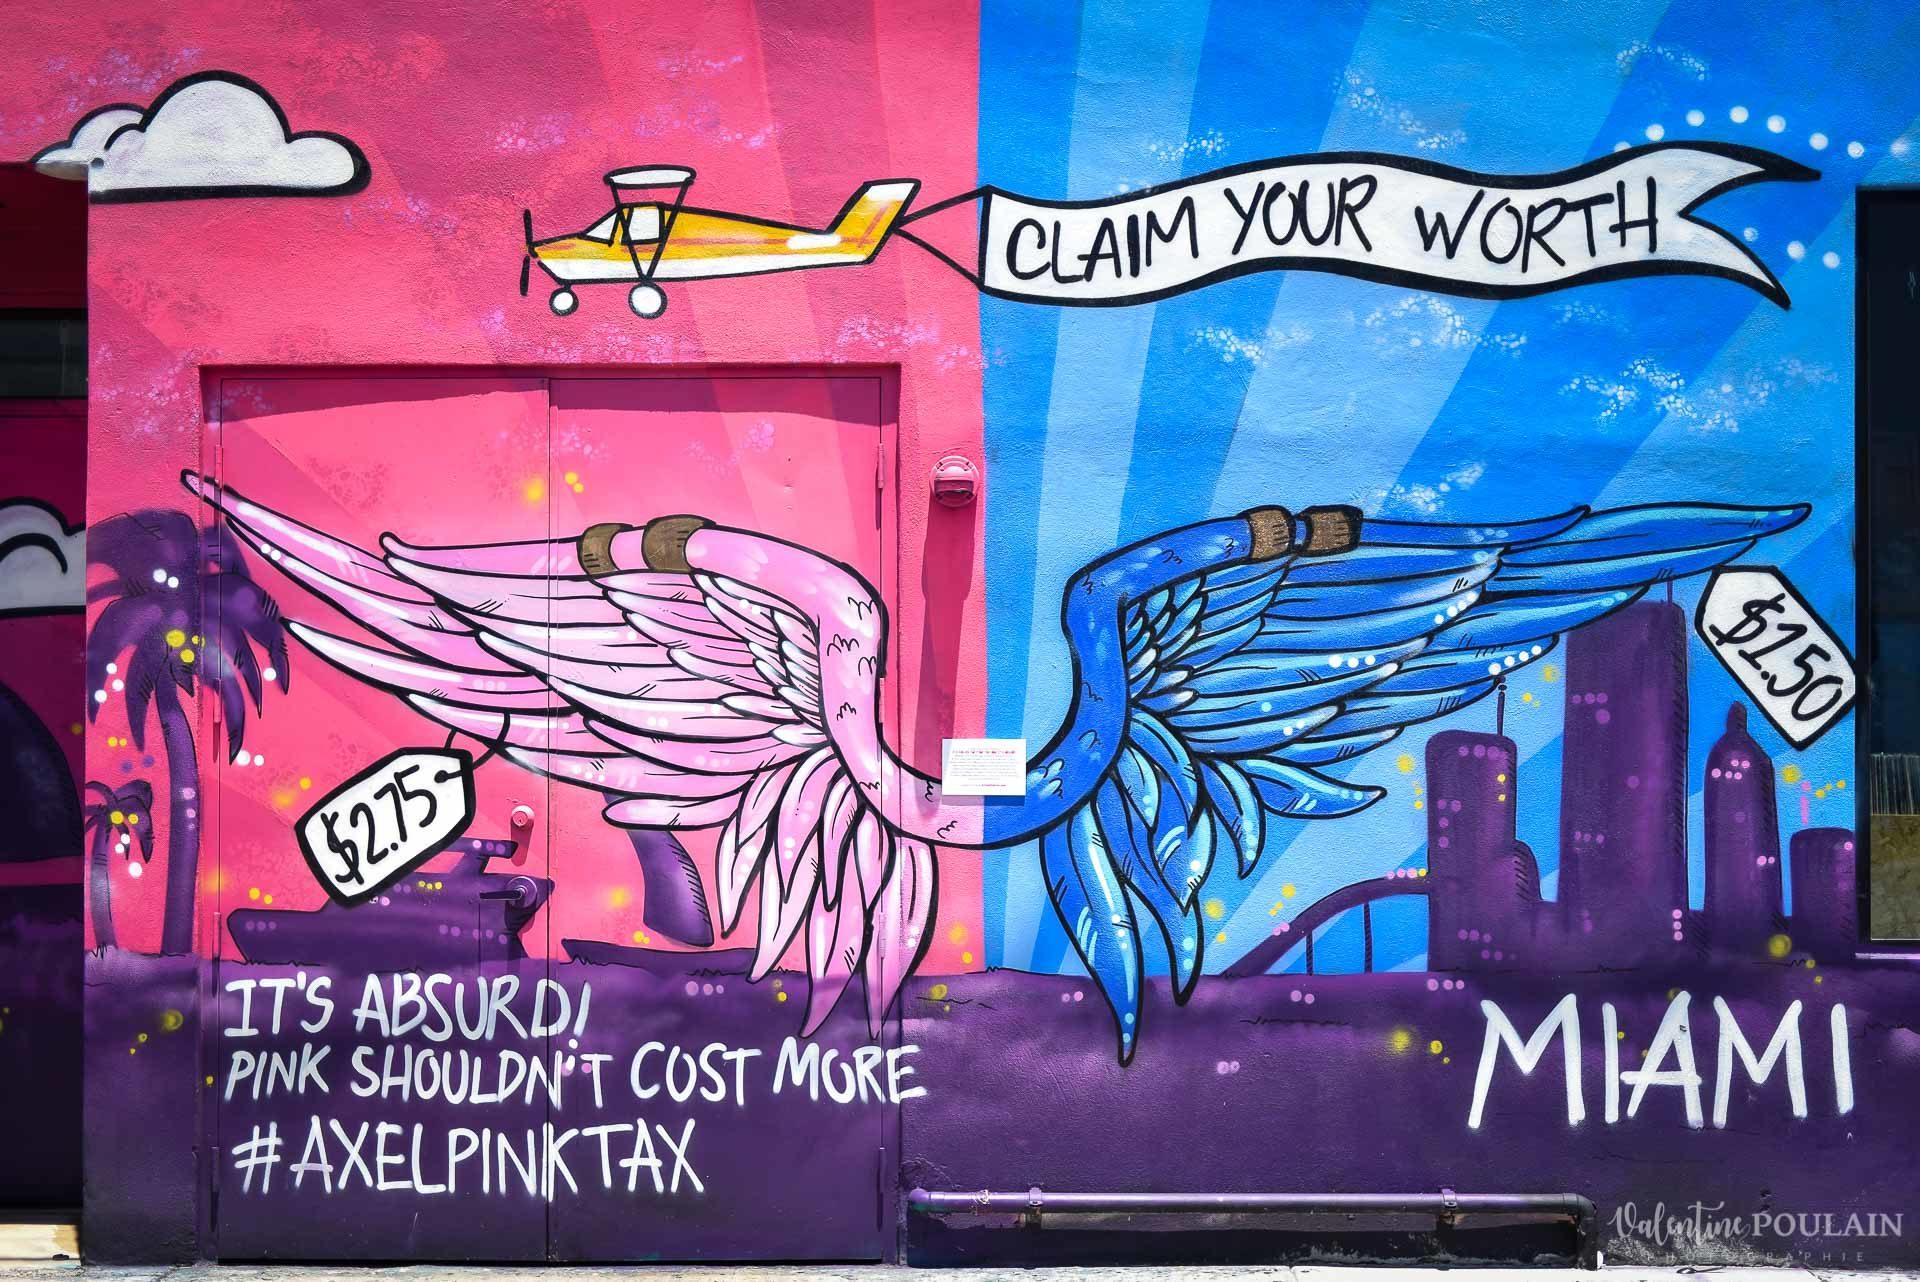 Couple Miami Wynwood - Valentine Poulain graffiti